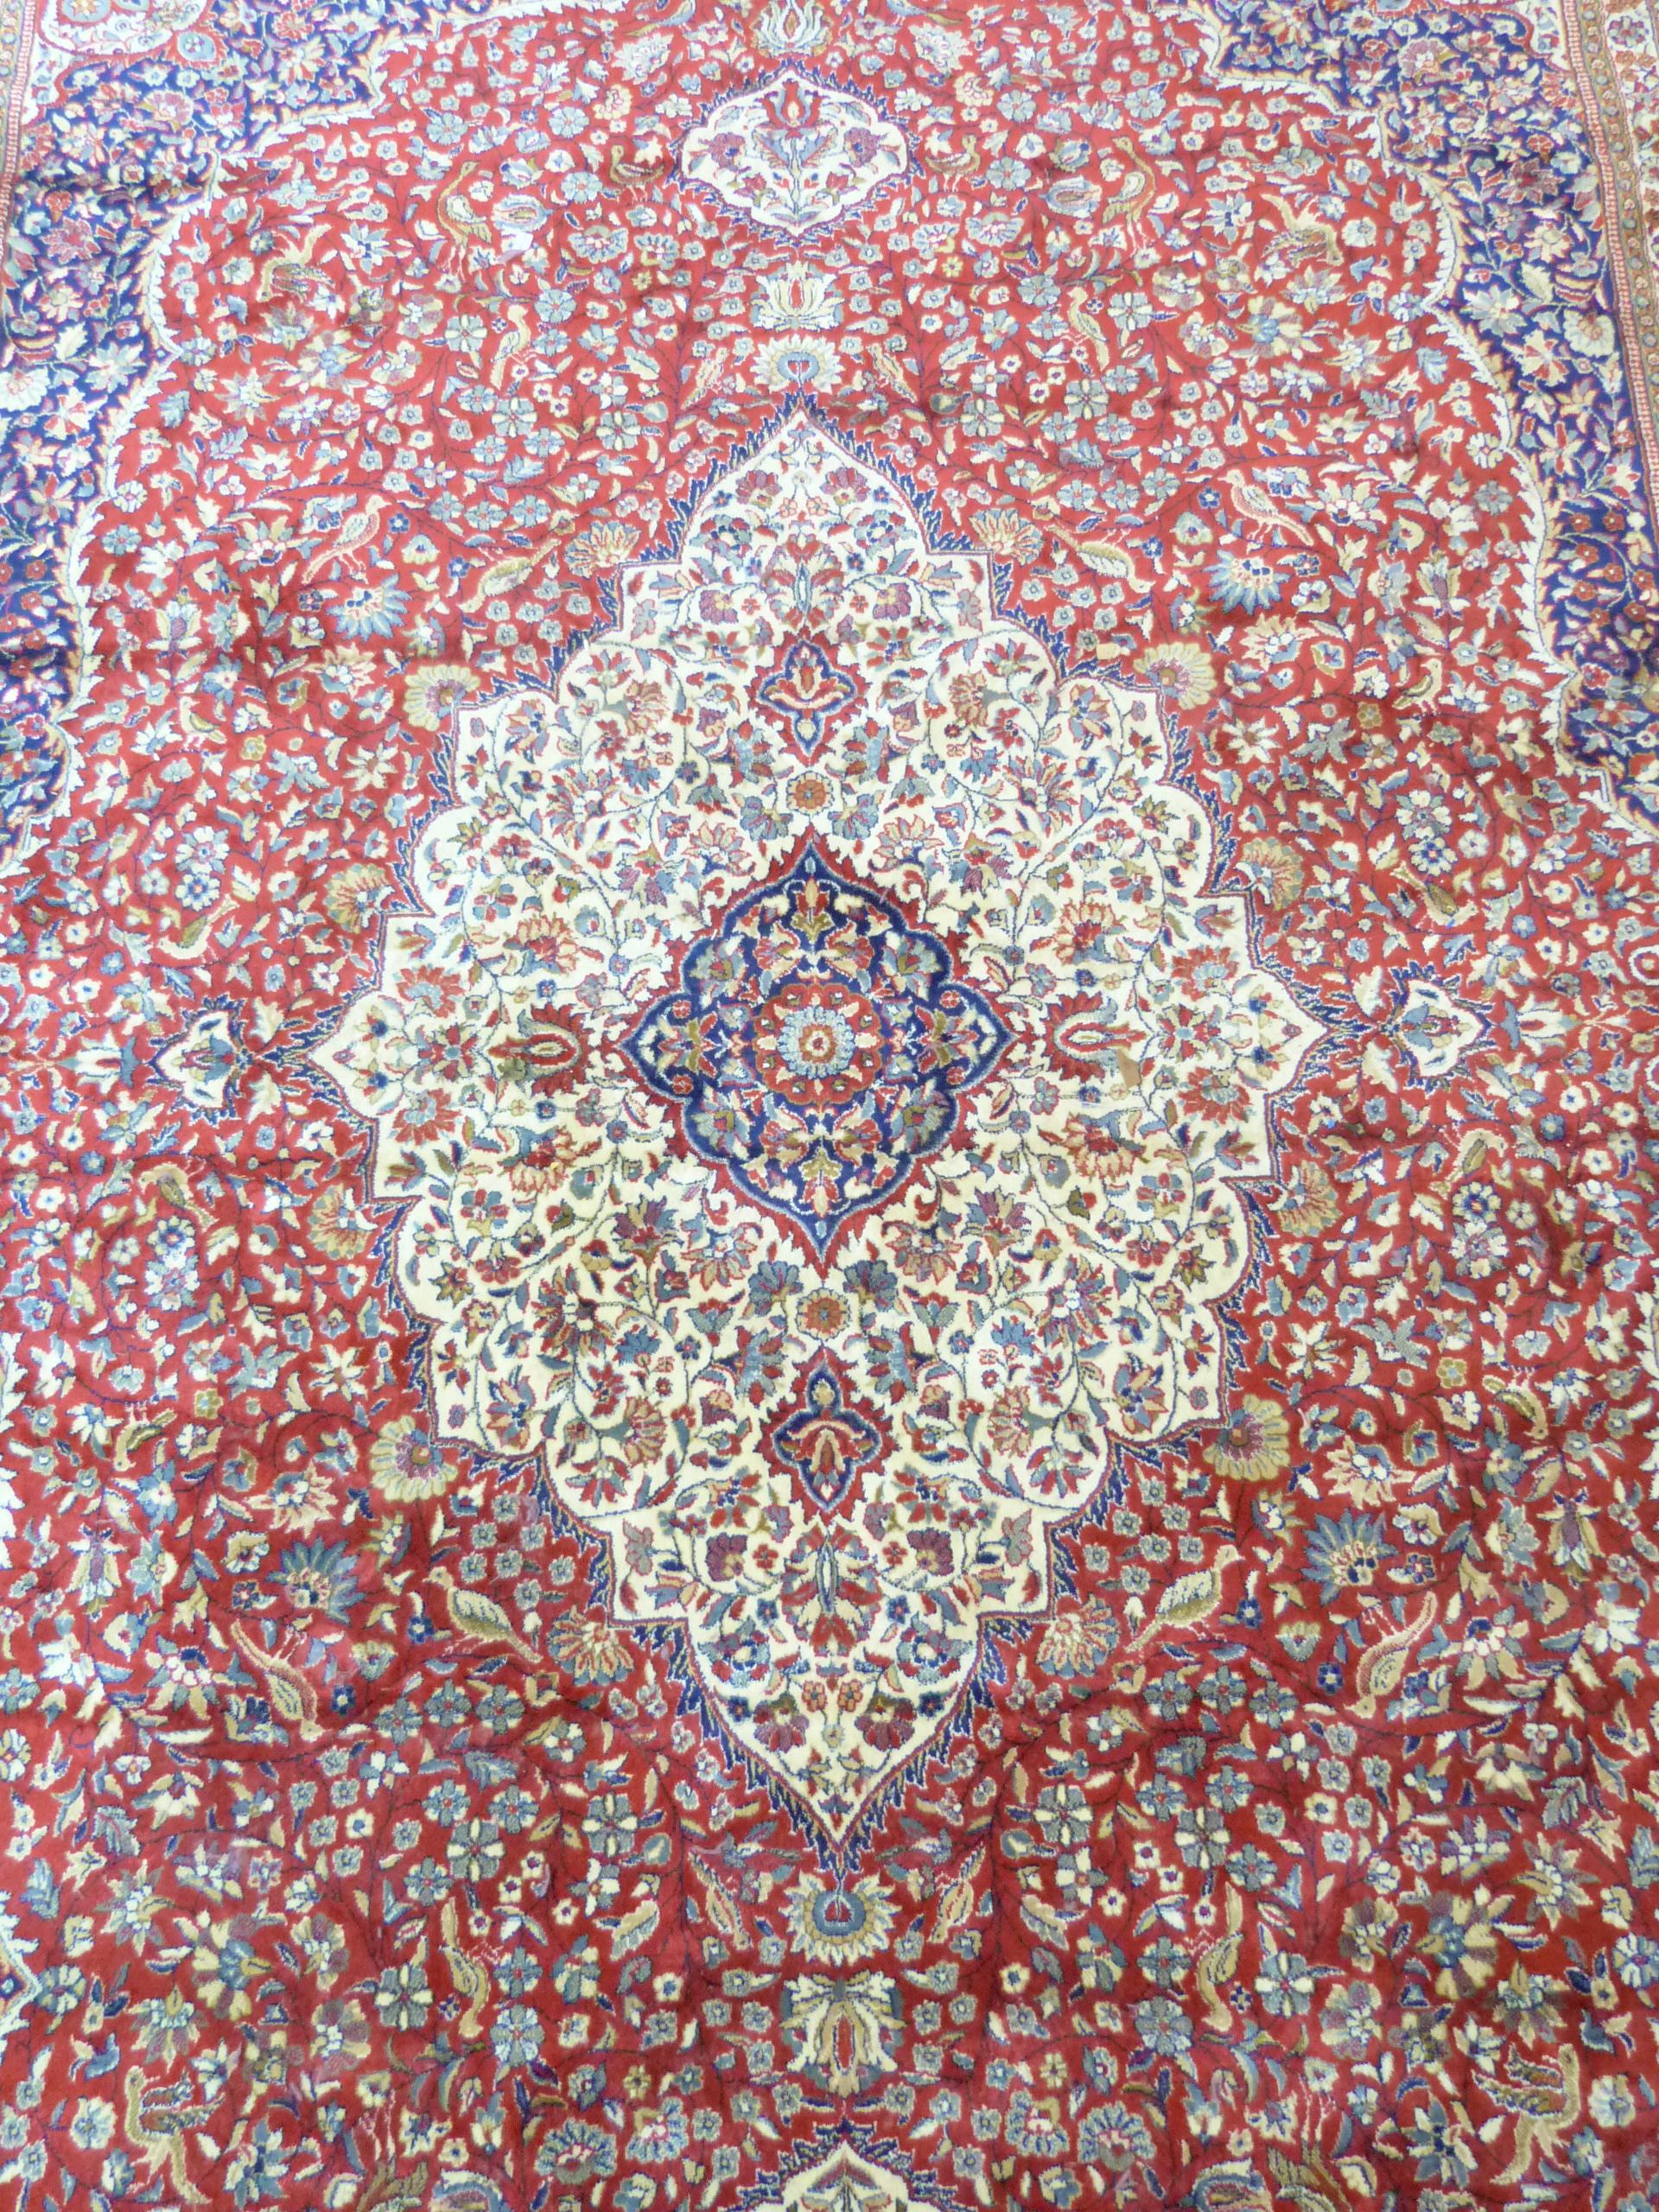 Large red ground full-pile Kashmir Carpet, floral medallion design, 340cm x 230 cm approx - Image 6 of 8